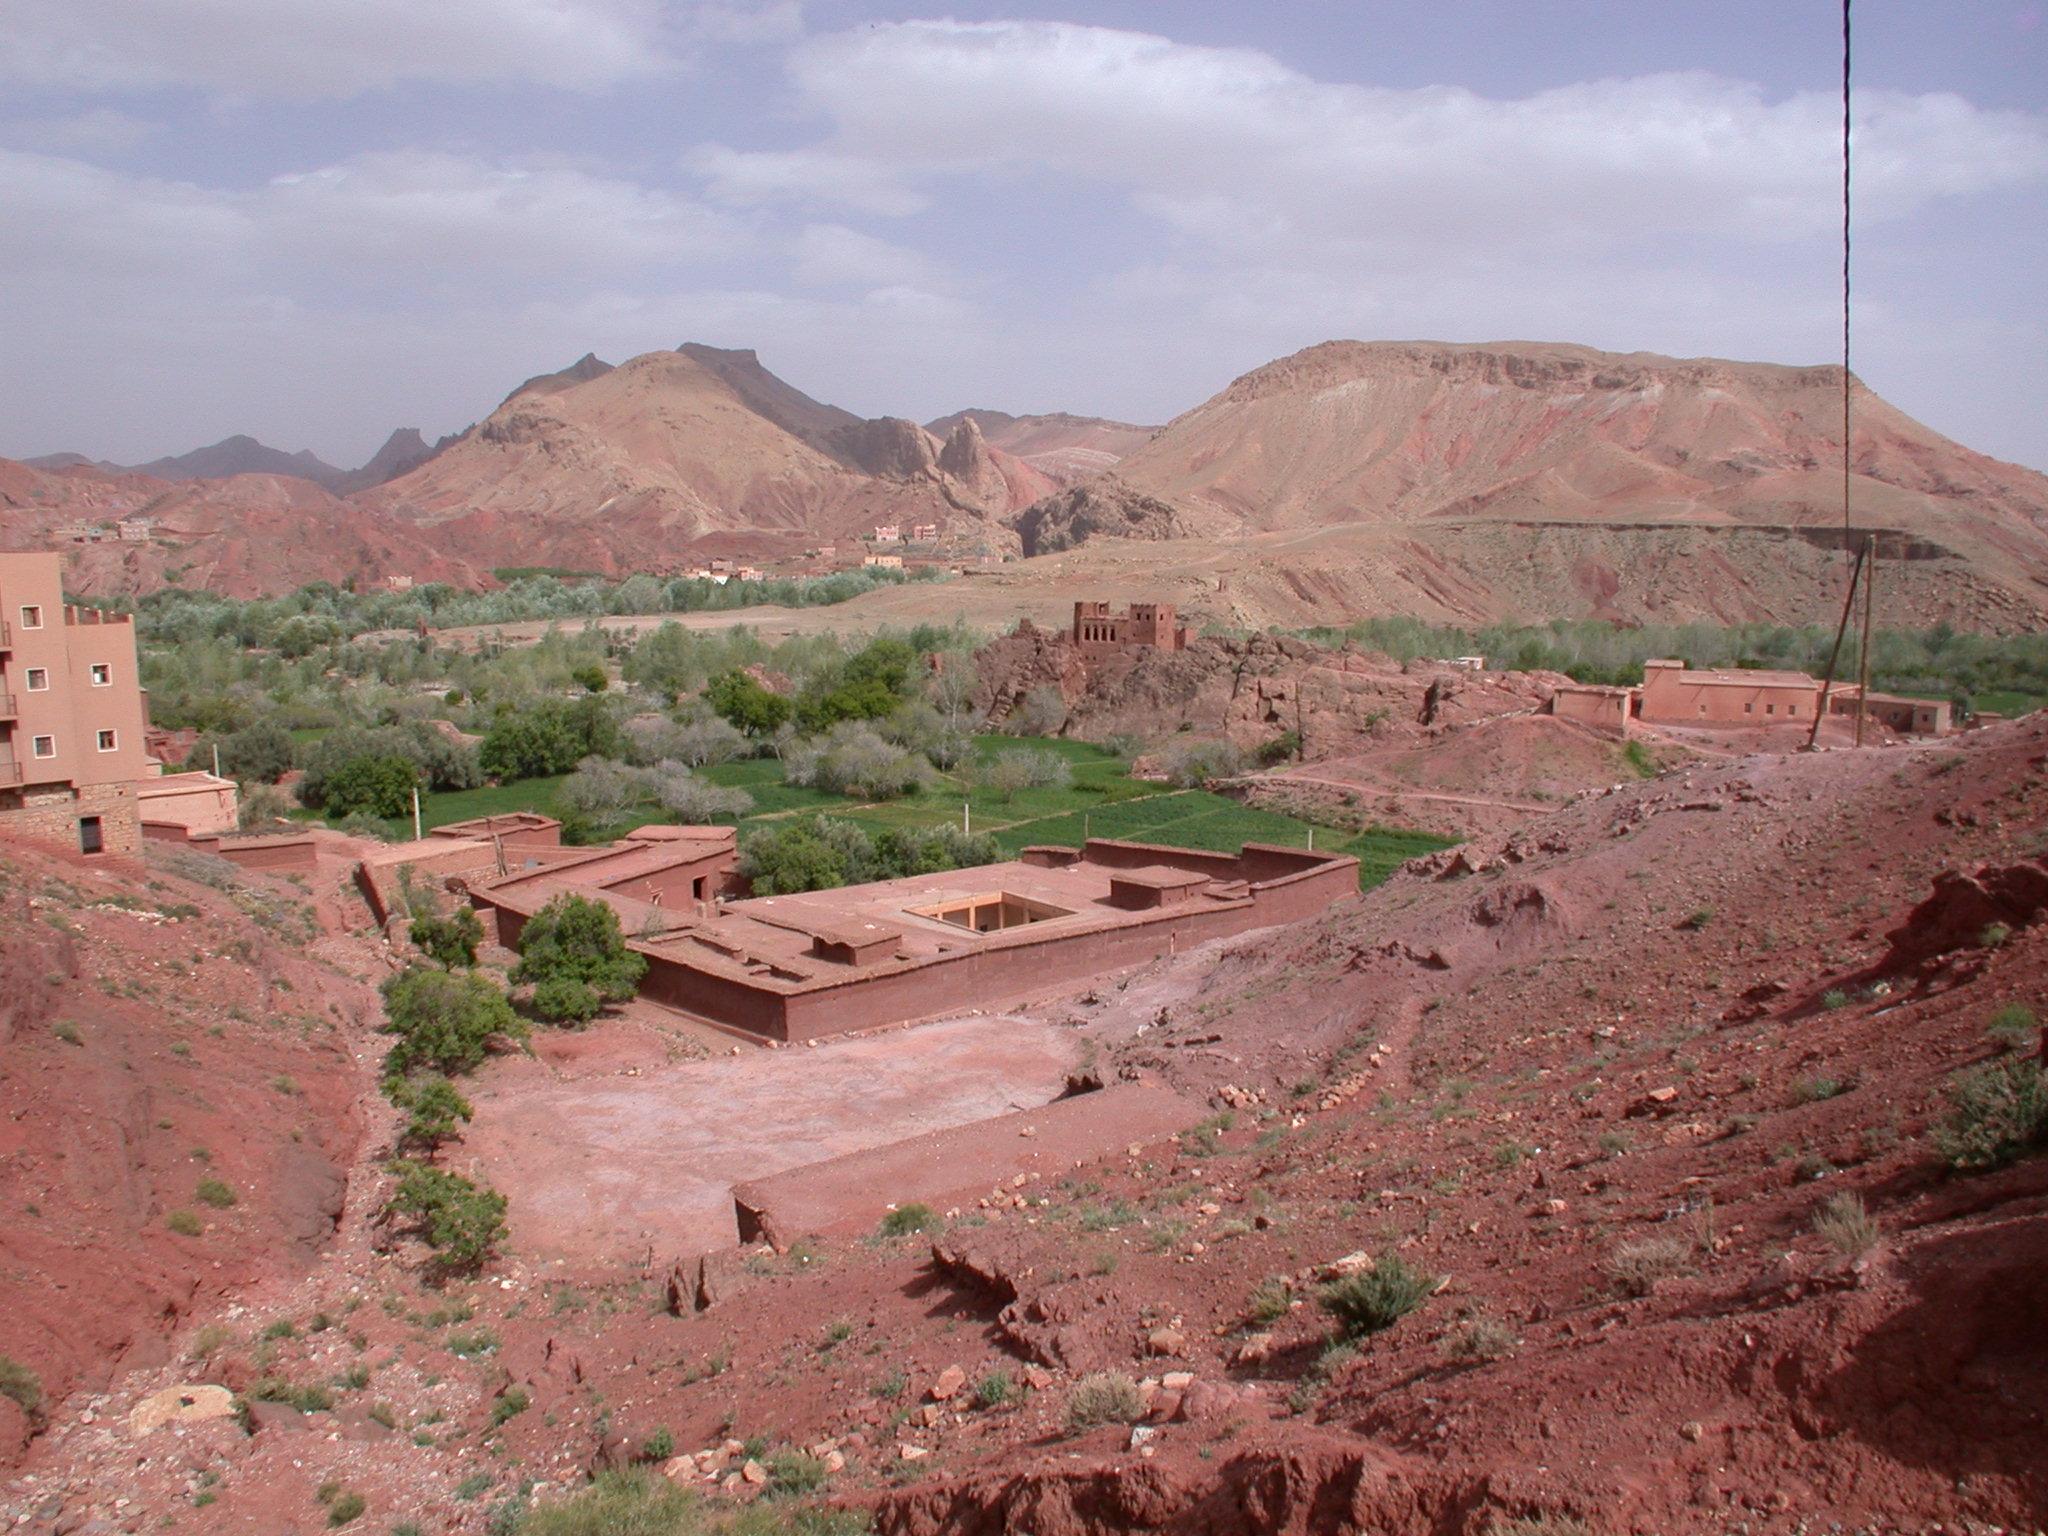 Luca Errera, Daniela Trastulli, Marocco, via delle kasbah, kasbah